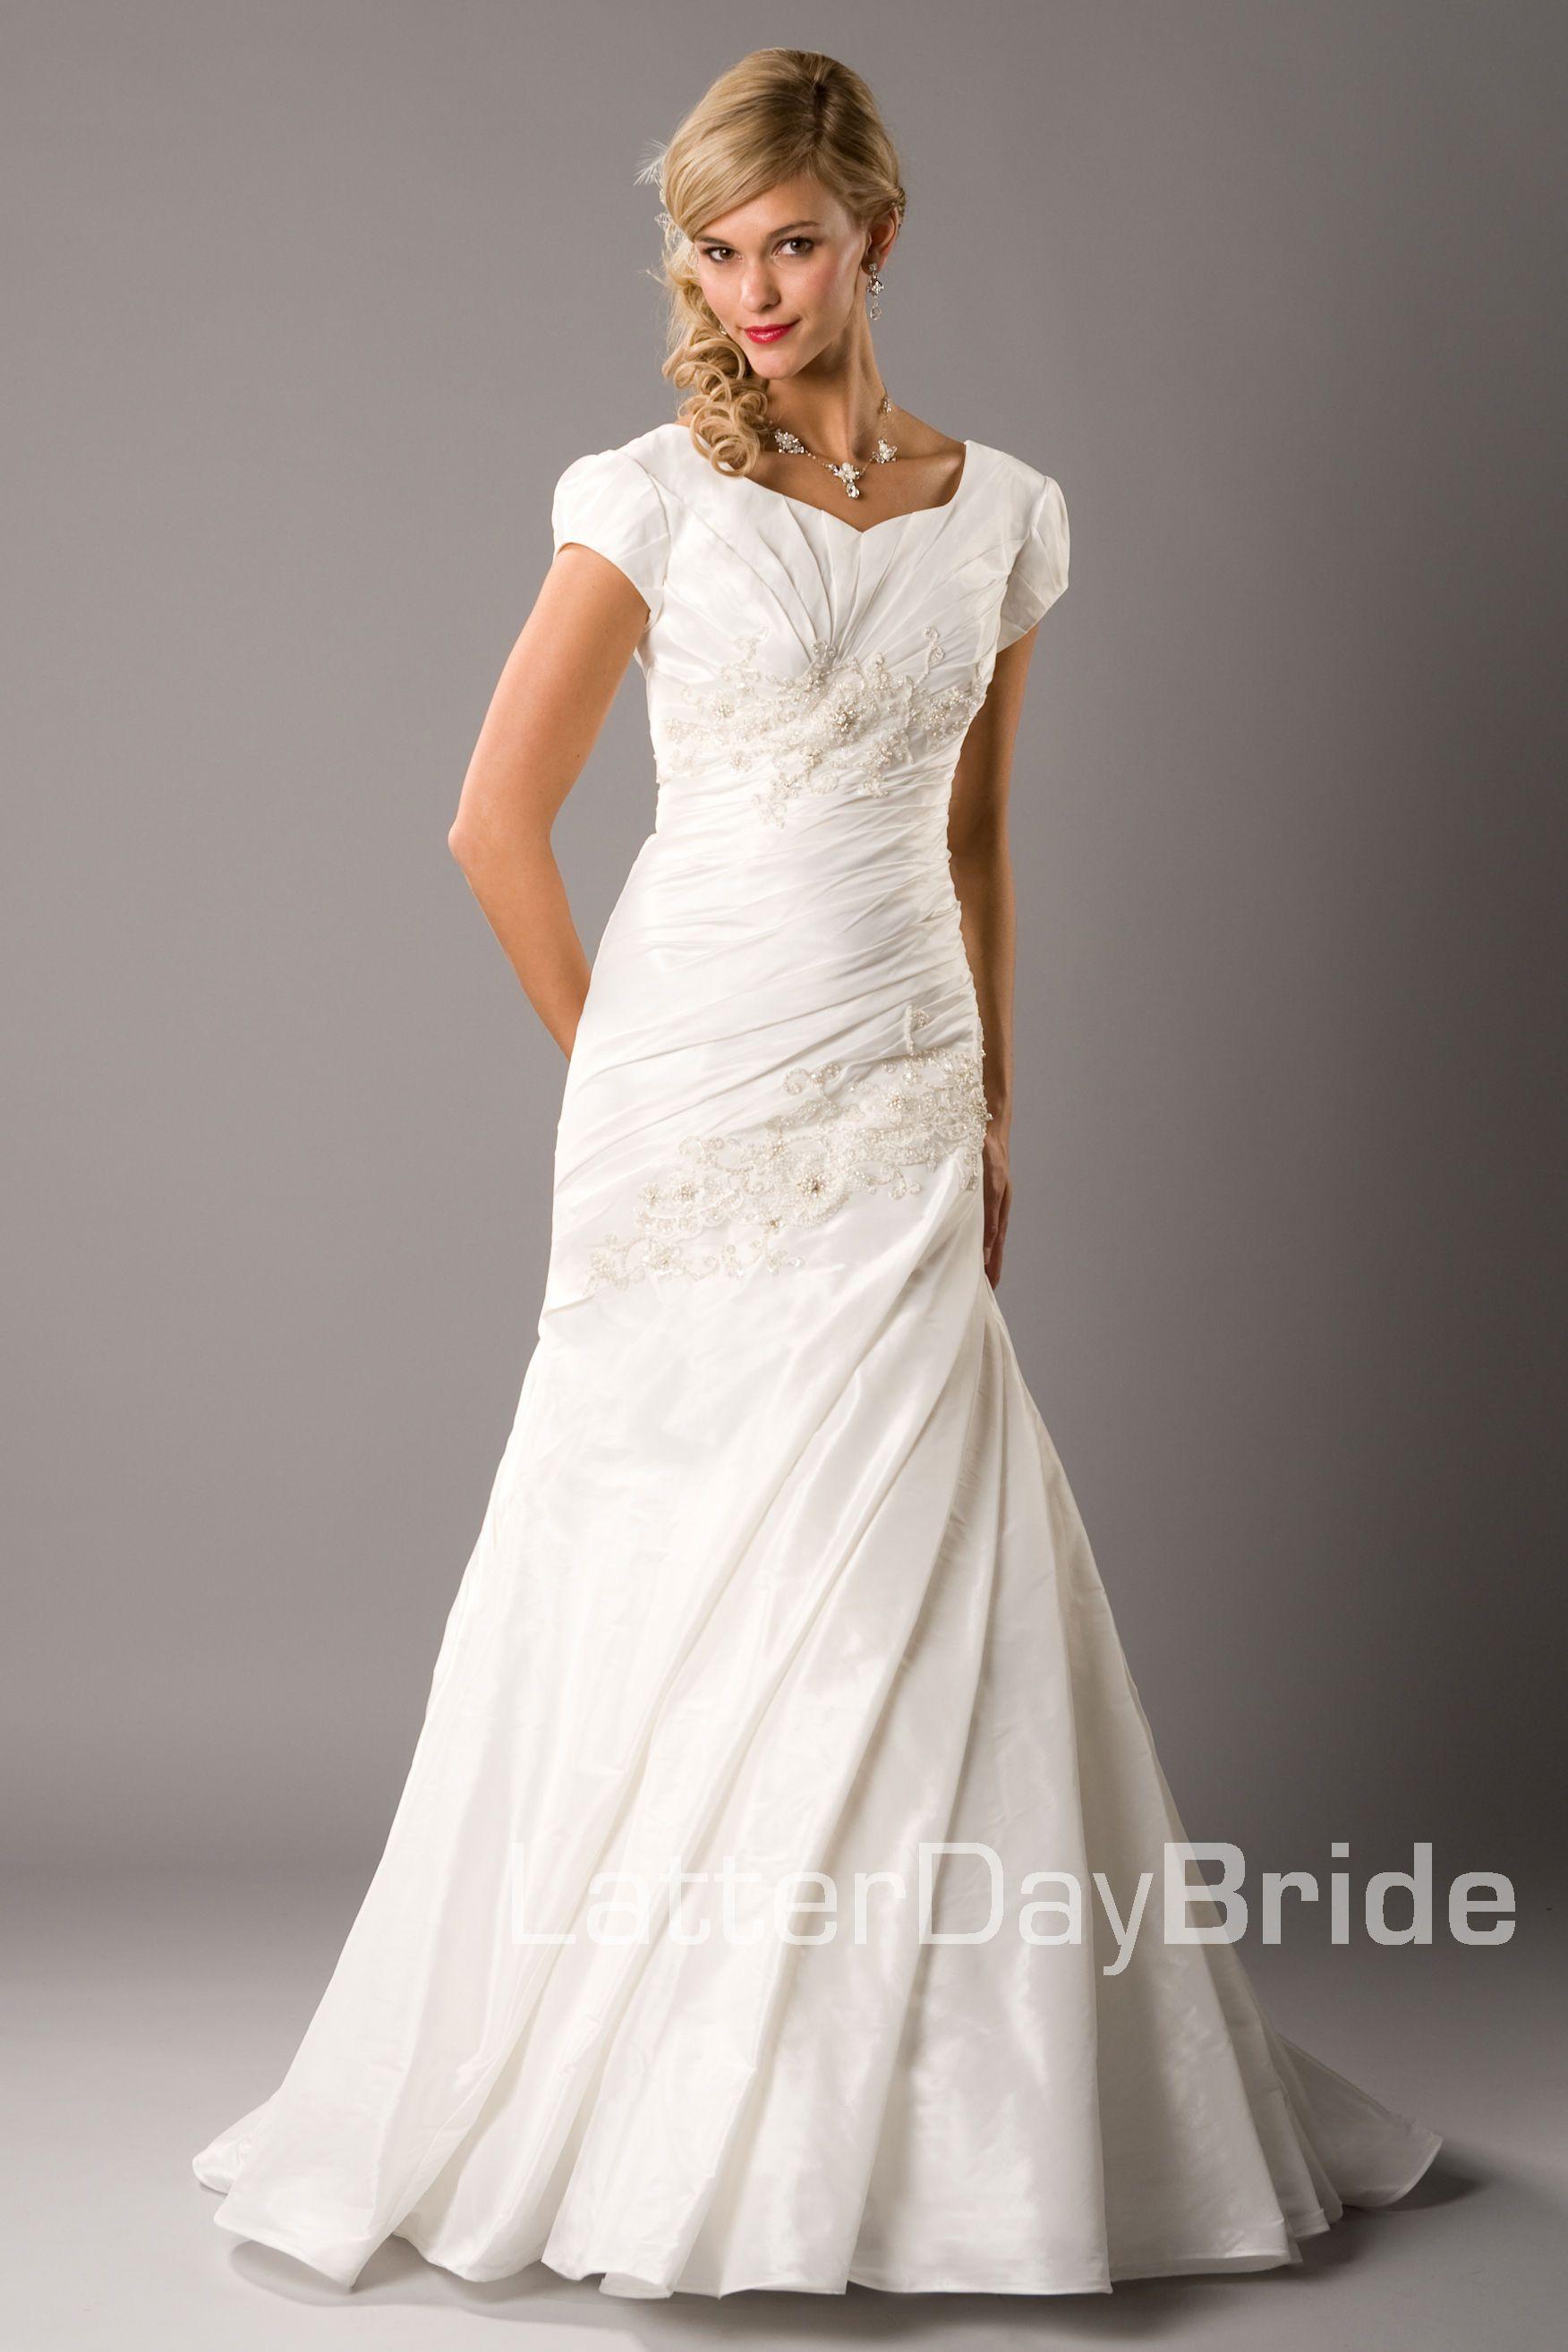 Modest Wedding Dress, Claudette LatterDayBride & Prom